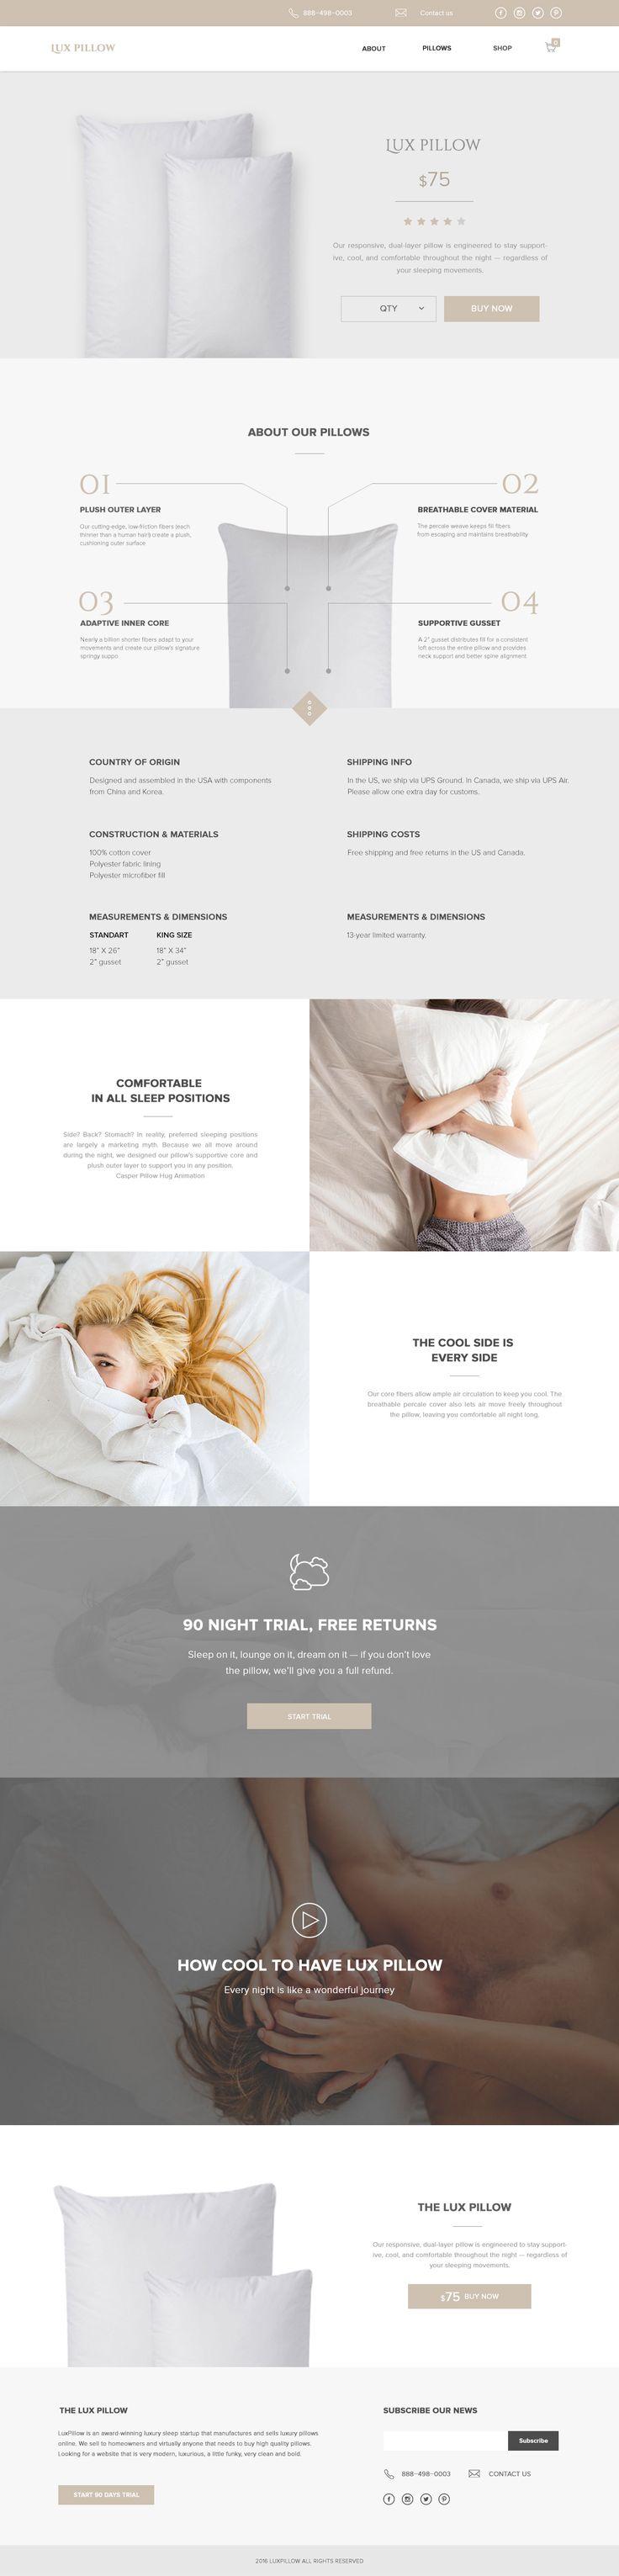 Sleep pillow product